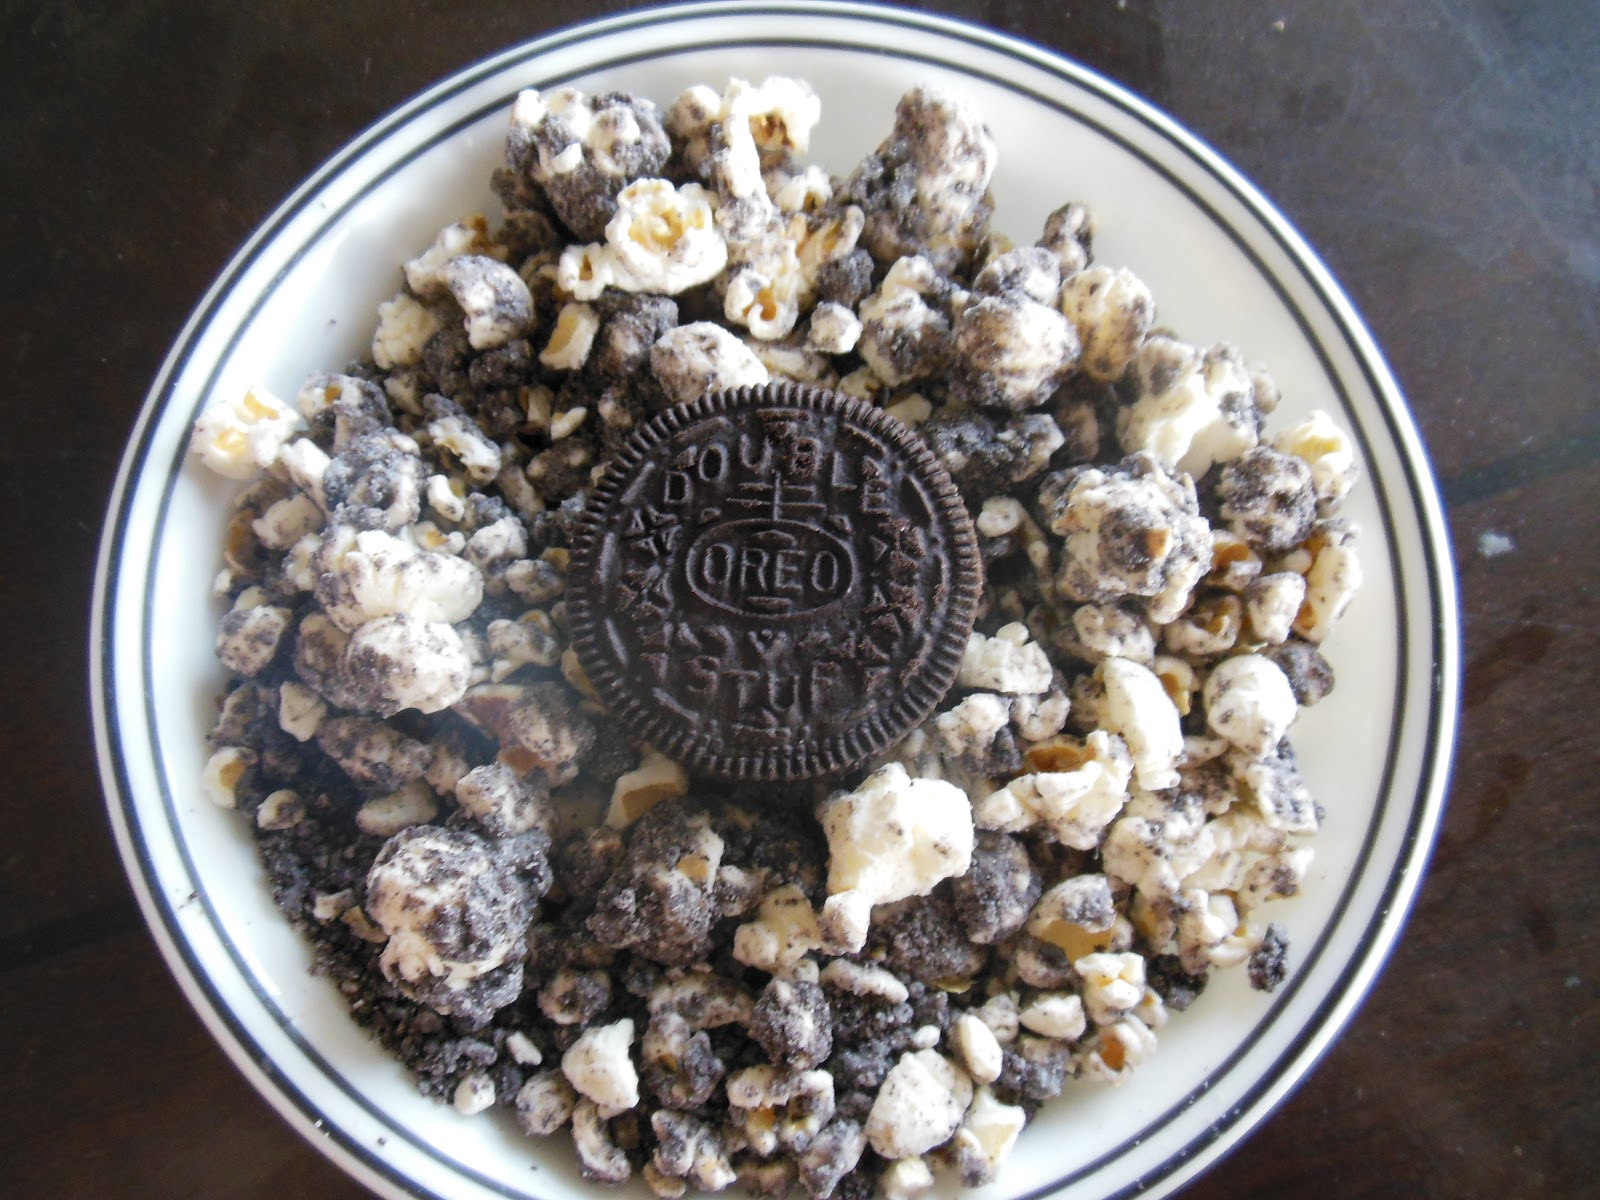 Sadie's Kitchen Adventures: Cookies and Cream Popcorn